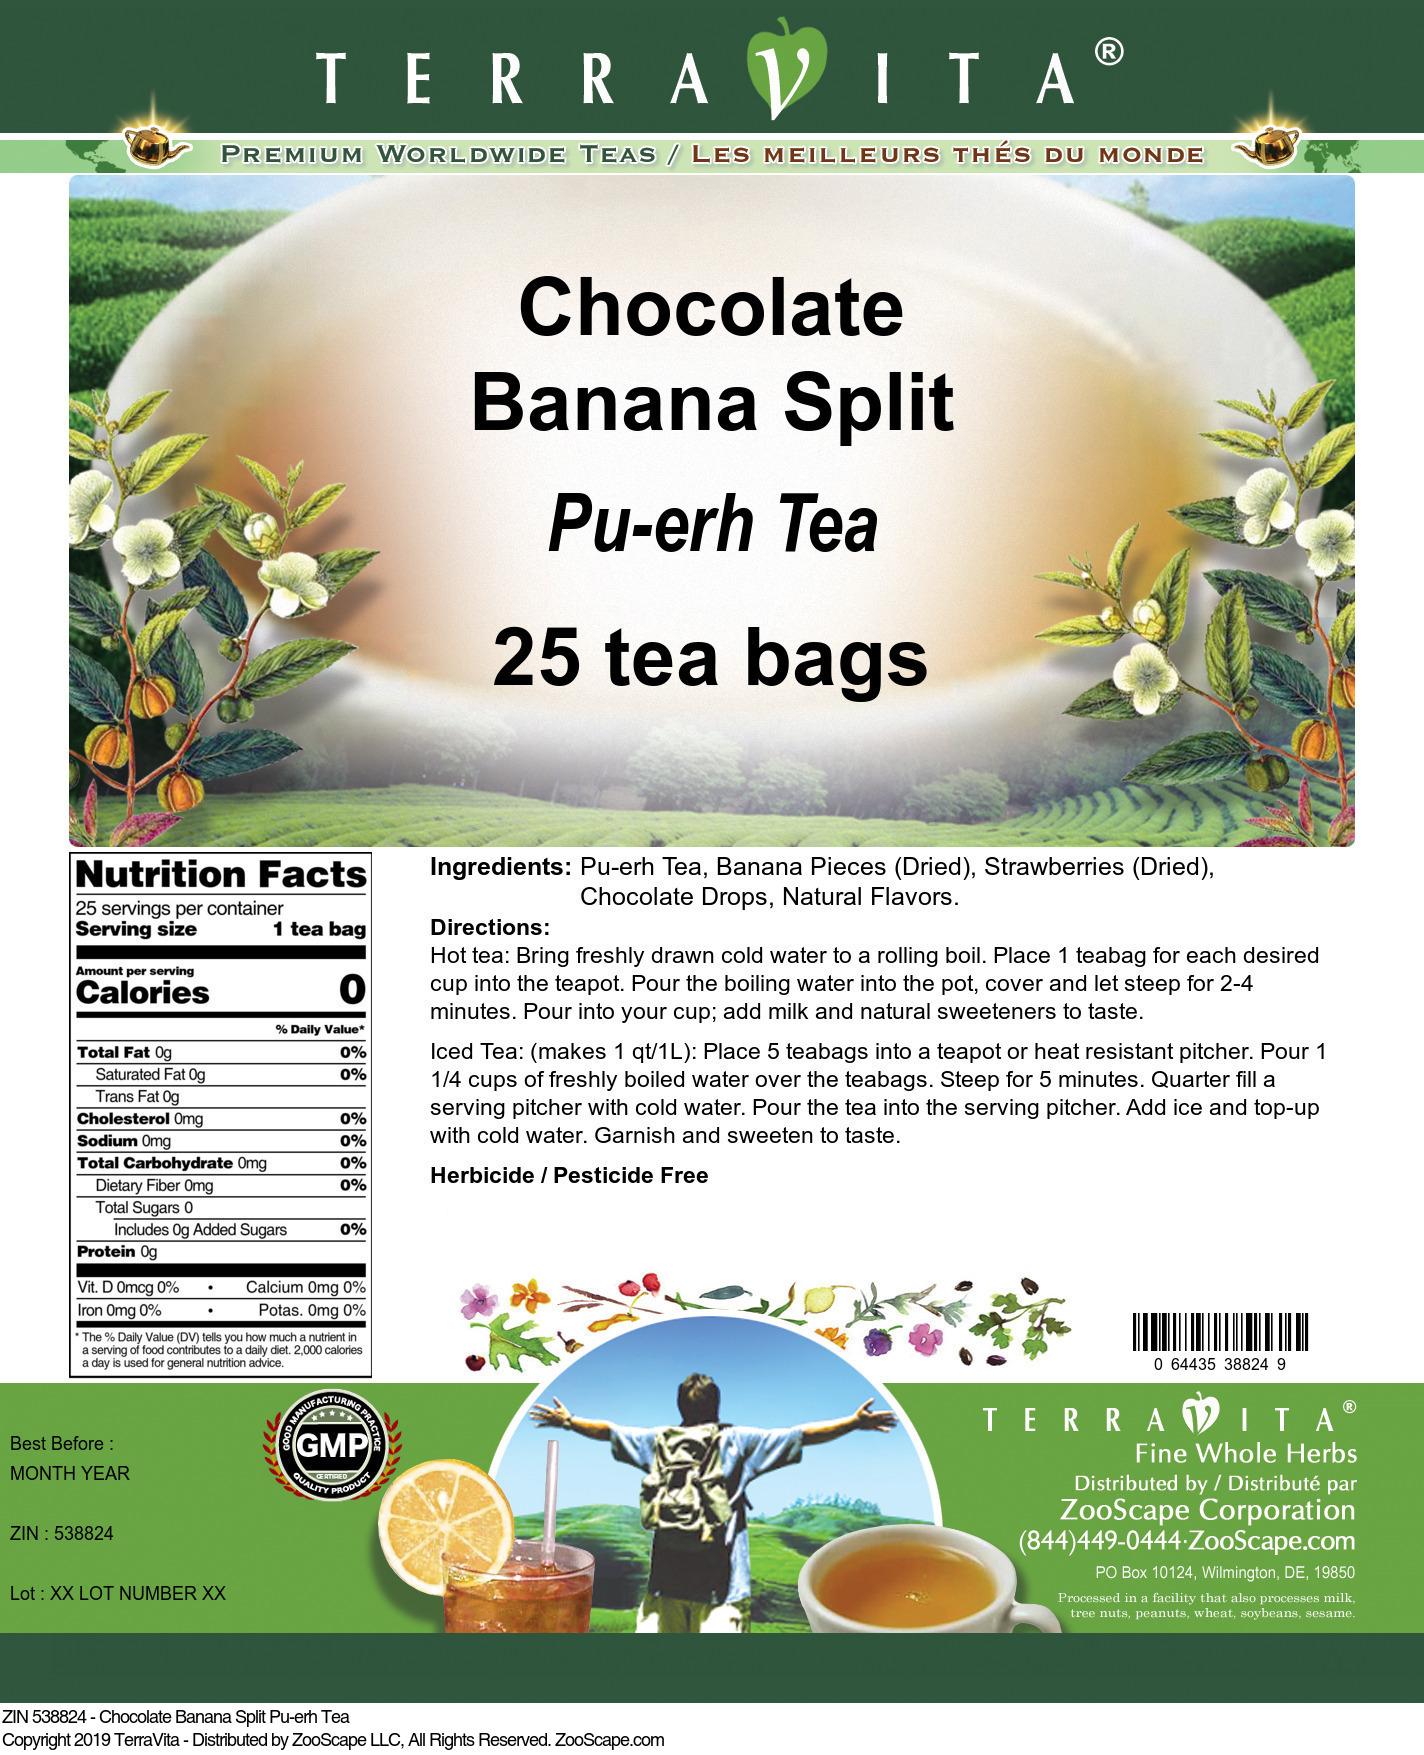 Chocolate Banana Split Pu-erh Tea